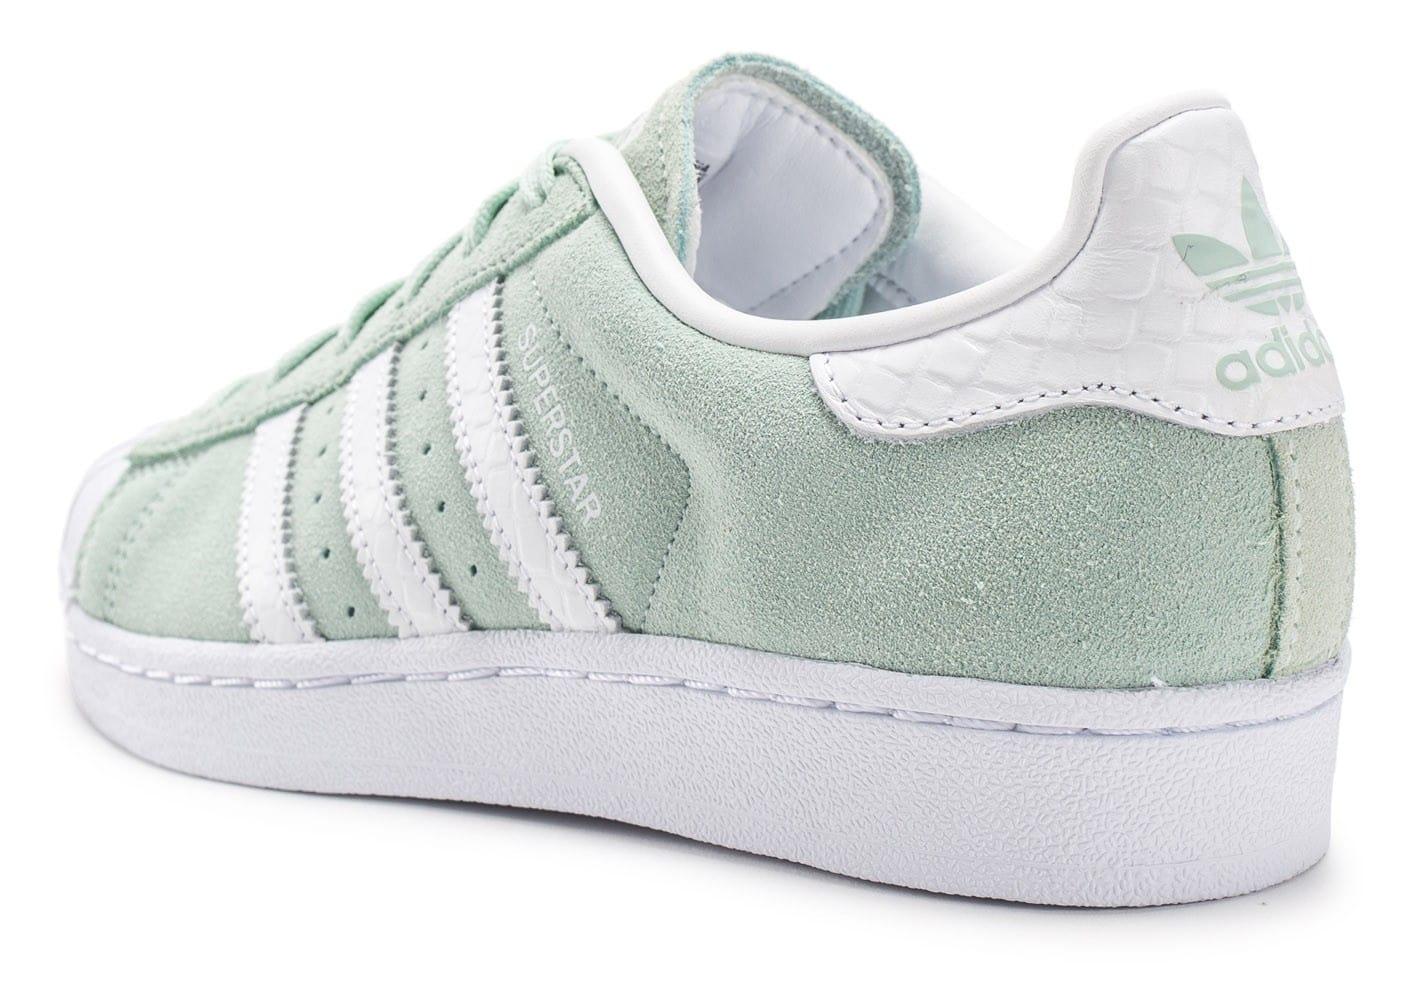 adidas superstar daim vert Off 60% - www.bashhguidelines.org